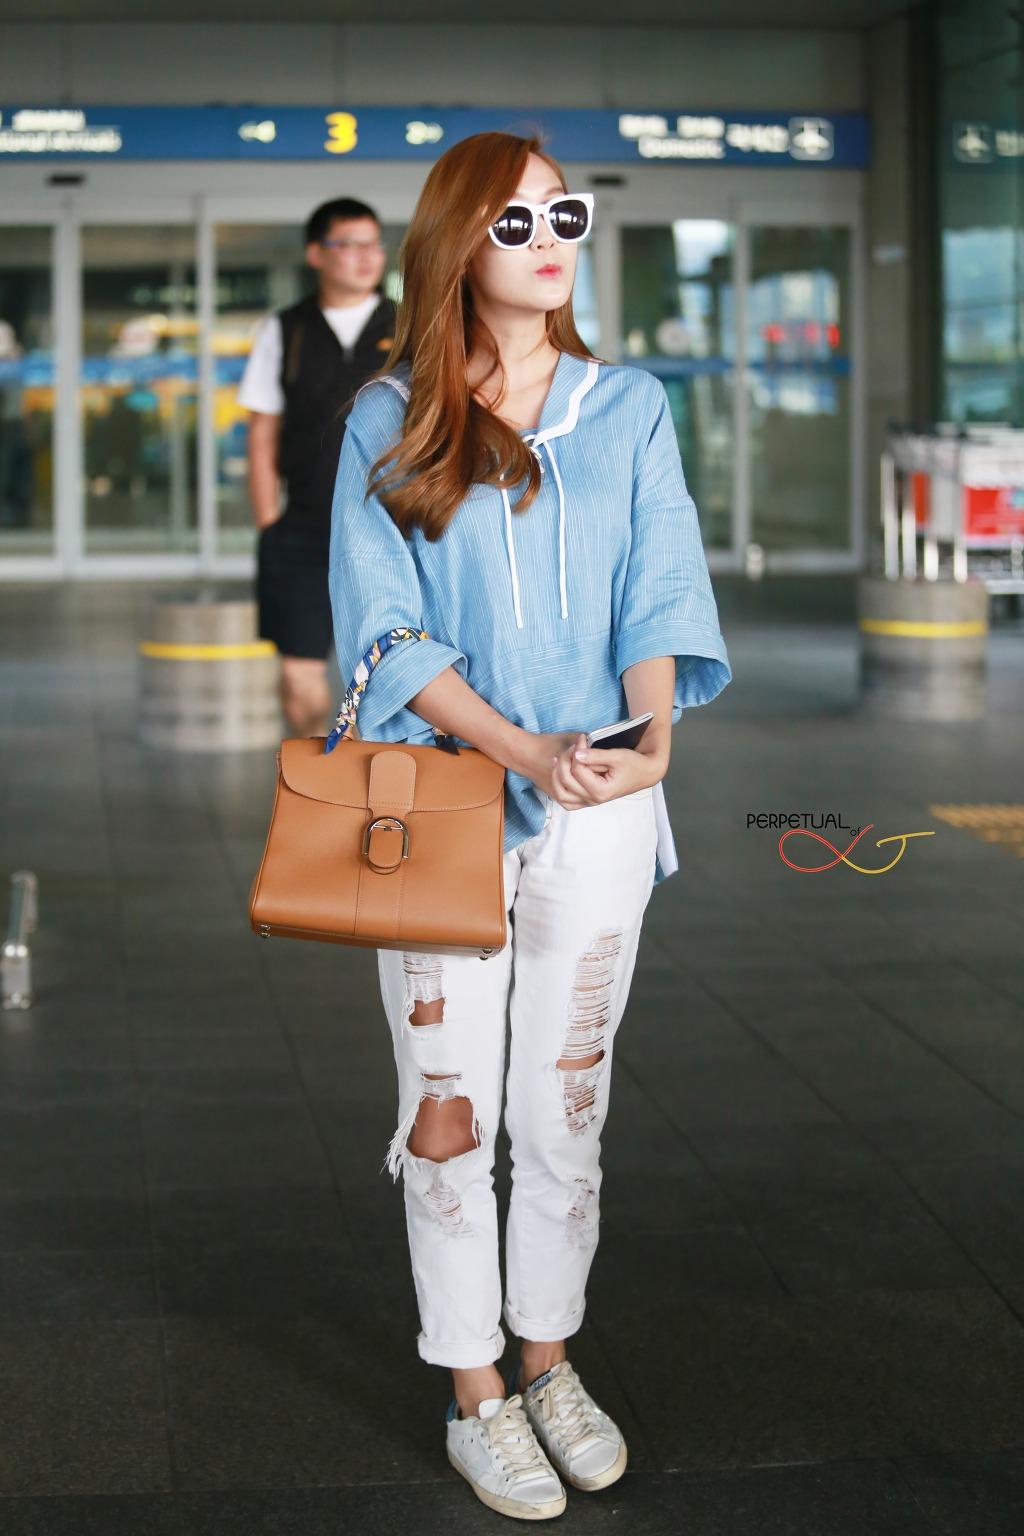 Jessica Airport Fashion 2015